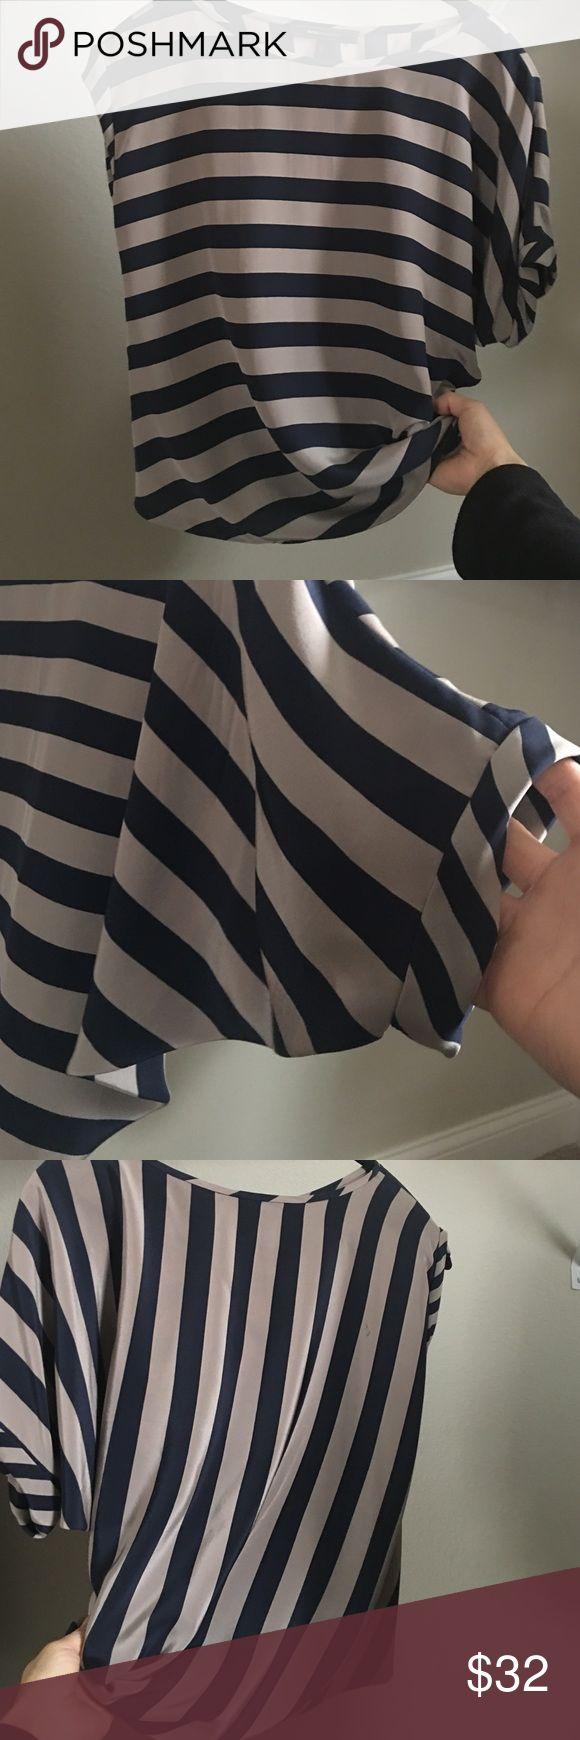 BCBGMaxAzria asymmetric top Navy and taupe stripes. Excellent condition. 100% silk. BCBGMaxAzria Tops Blouses